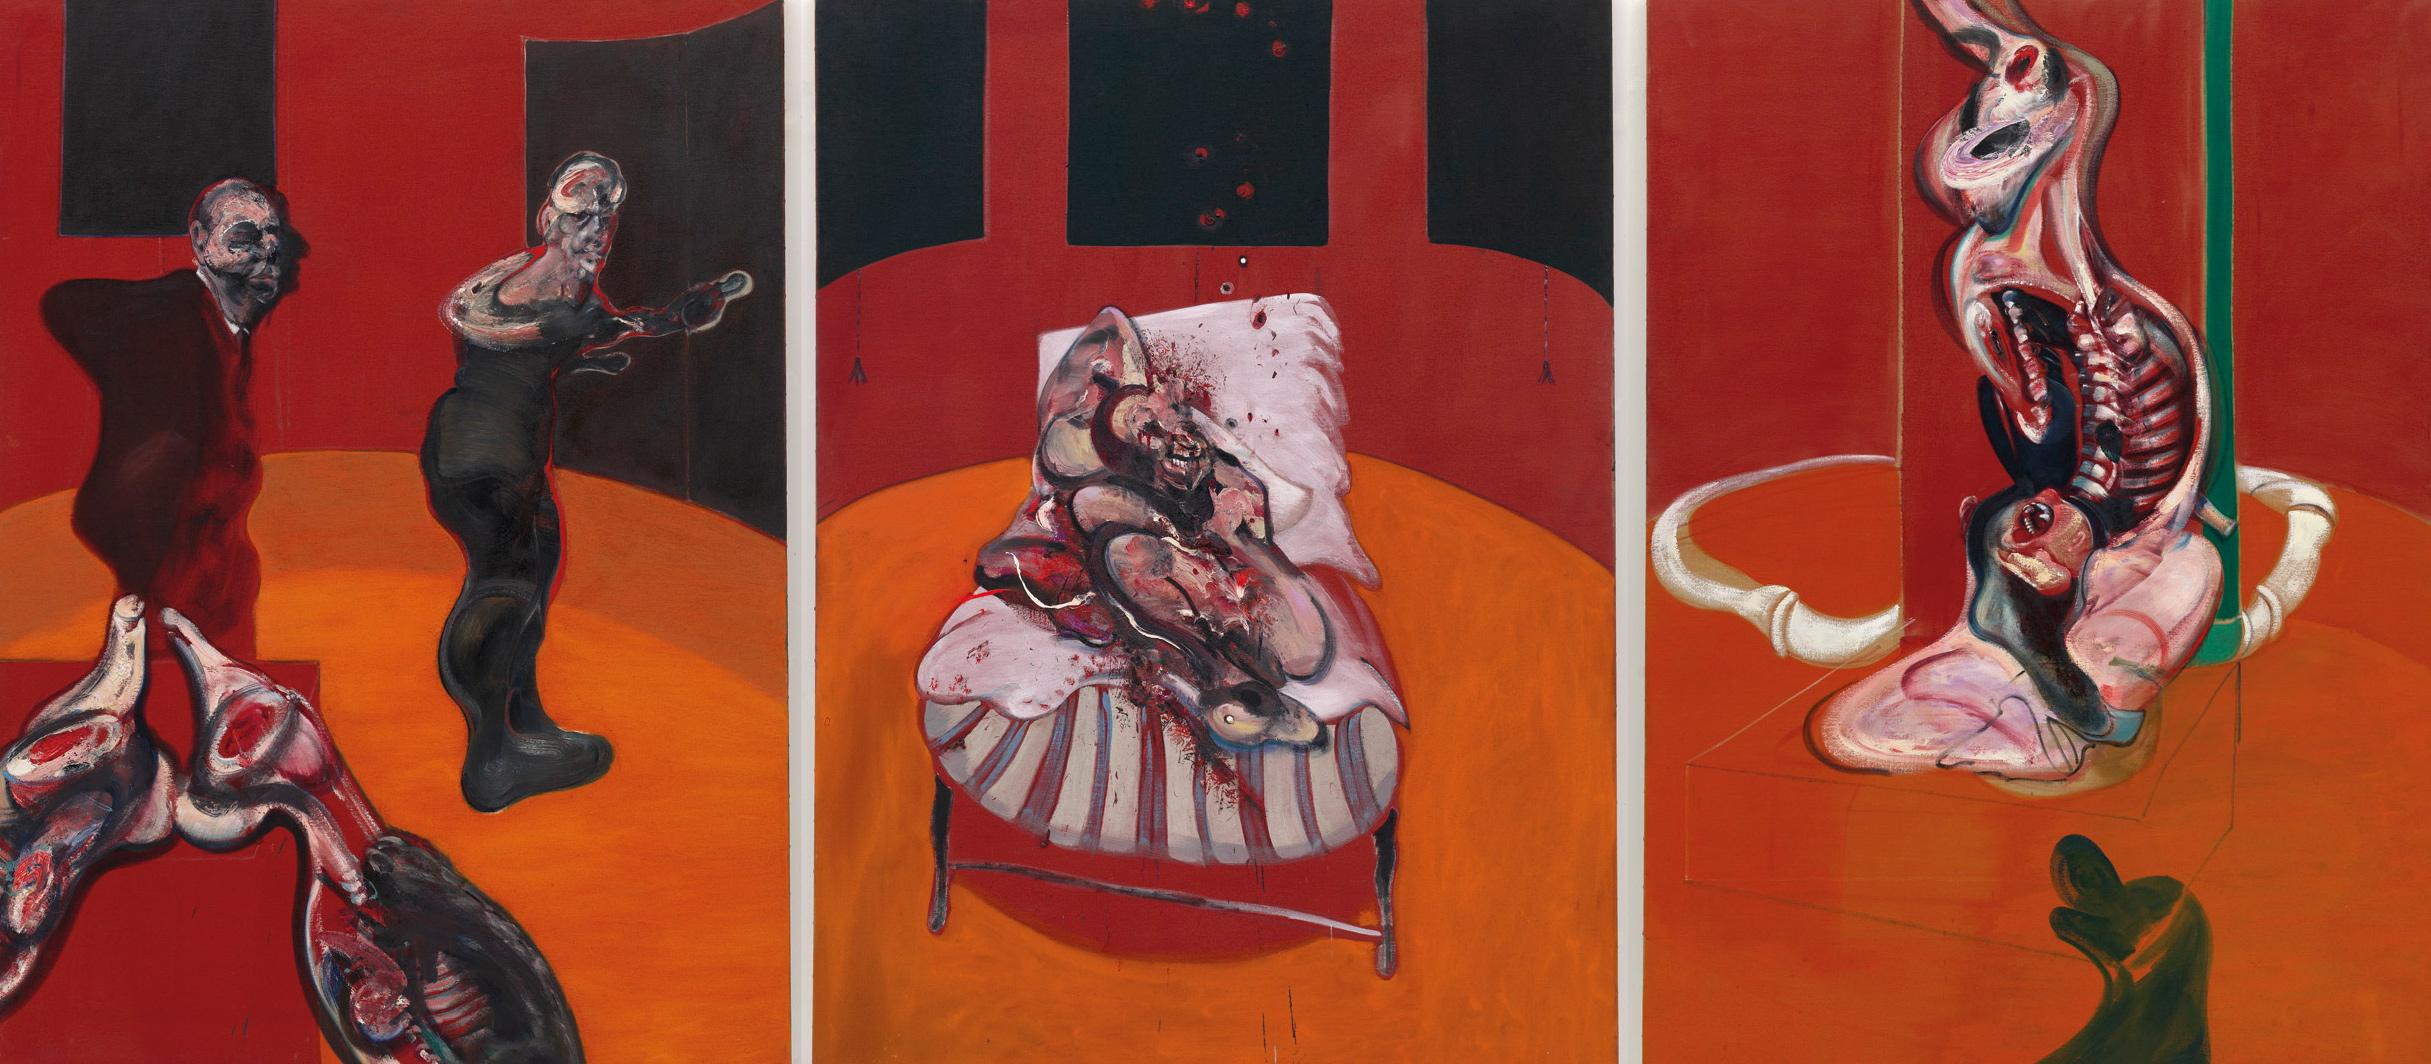 Francis Bacon Tres estudios para una crucifixión(Three Studies for a Crucifixion), marzo, 1962 Óleo con arena sobre lienzo, tres paneles 198,1 x 144,8 cm cada uno Solomon R. Guggenheim Museum, Nueva York, 64.1700 © The Estate of Francis Bacon. All rights reserved. DACS/VEGAP. Bilbao, 2015